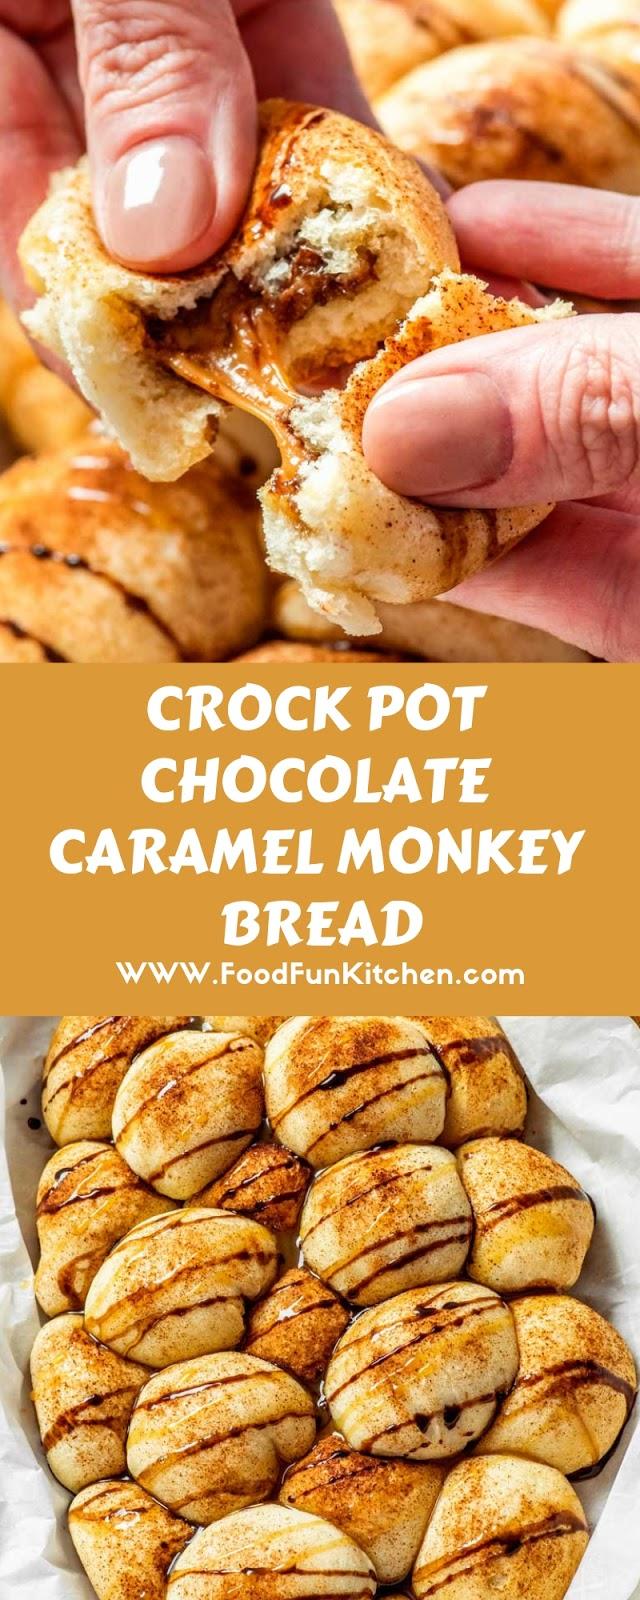 CROCK POT CHOCOLATE CARAMEL MONKEY BREAD